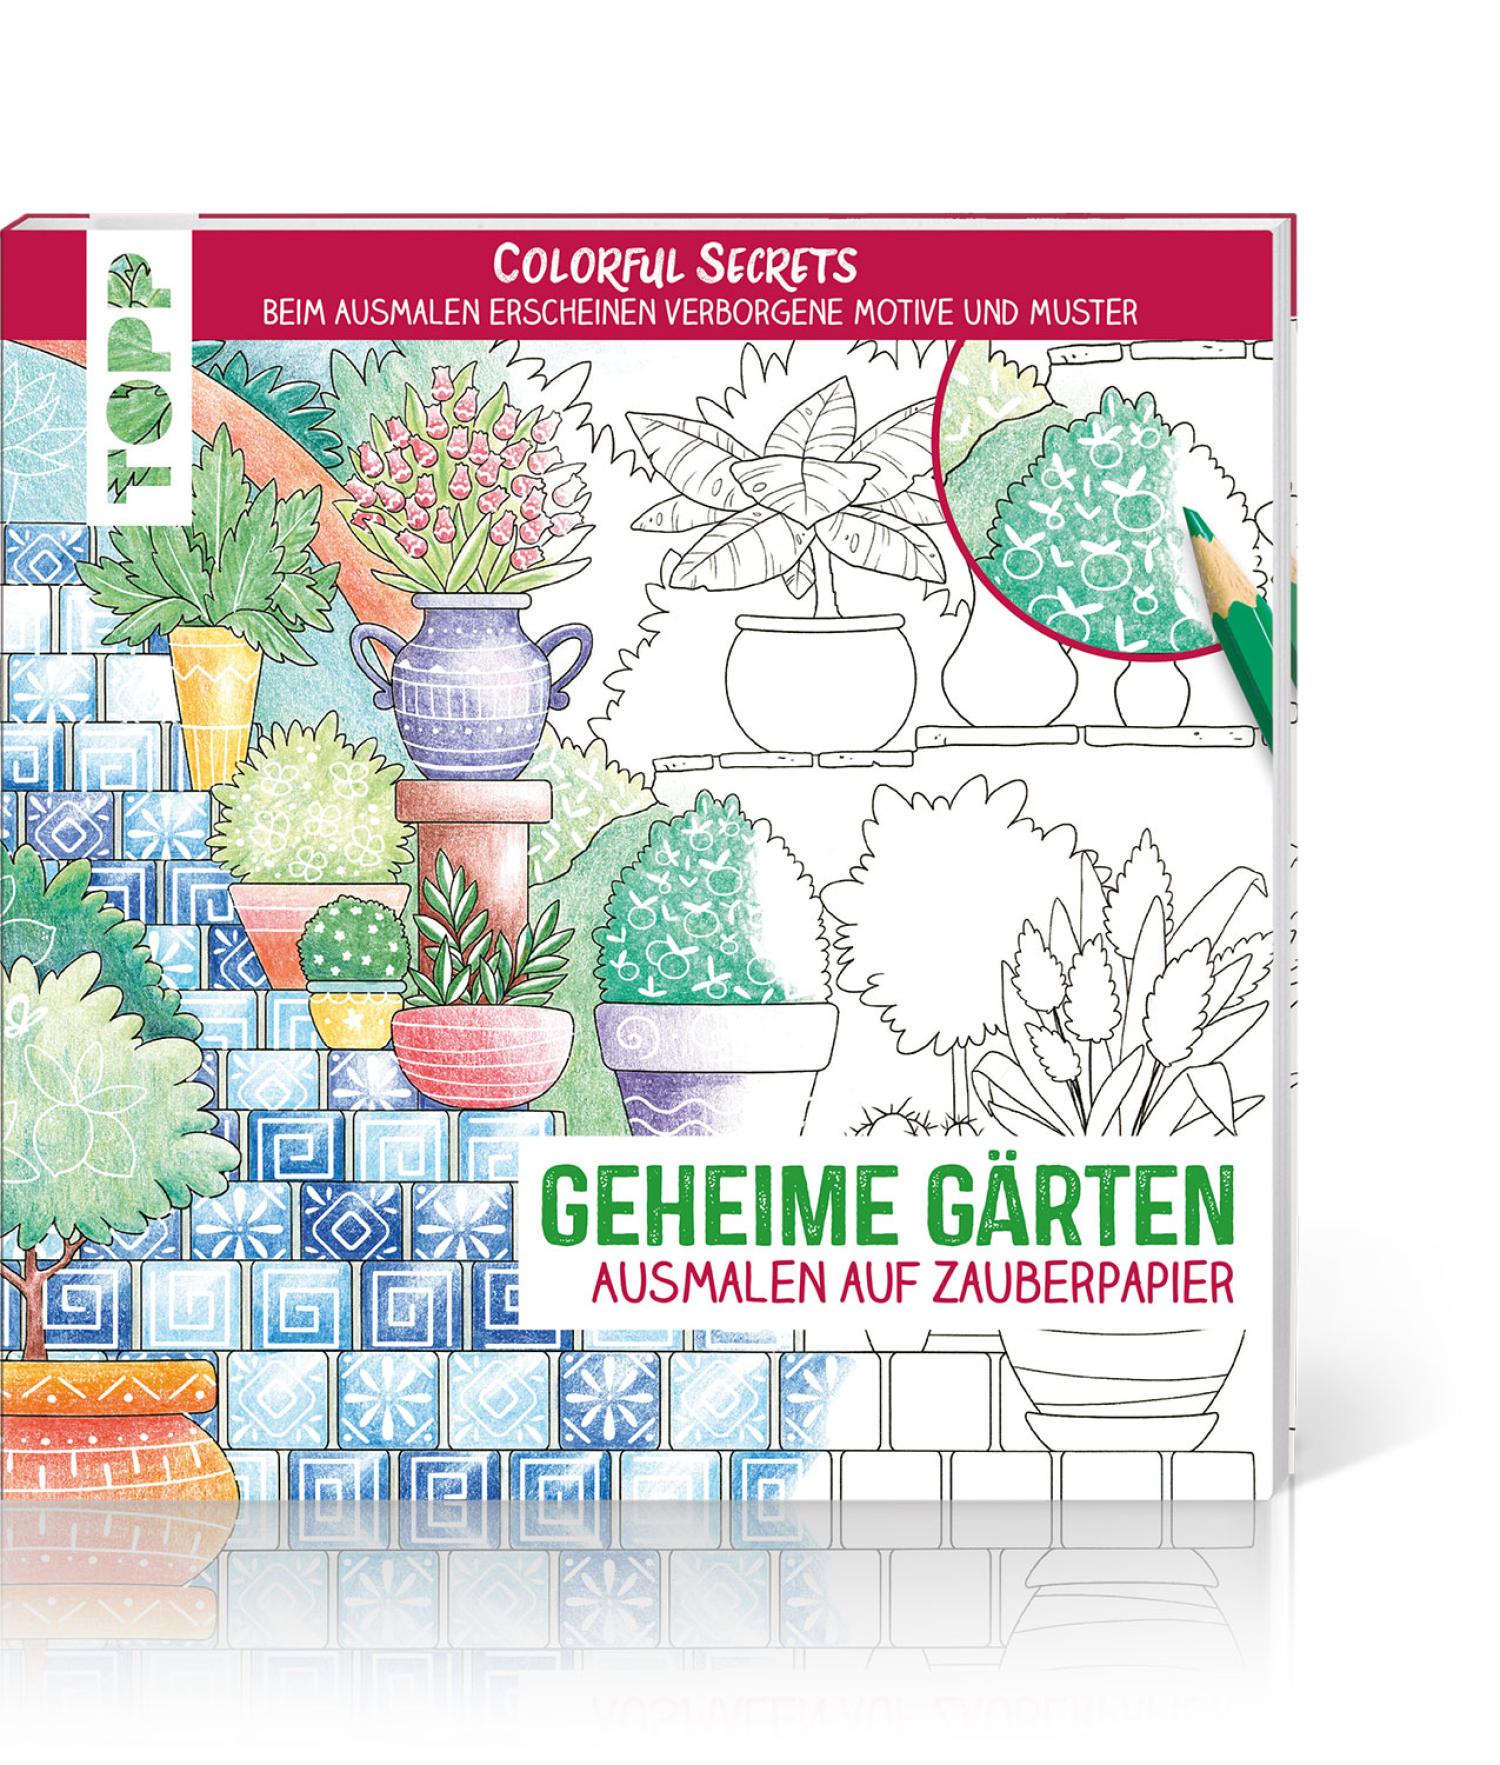 Colorful Secrets – Geheime Gärten, Produktbild 1